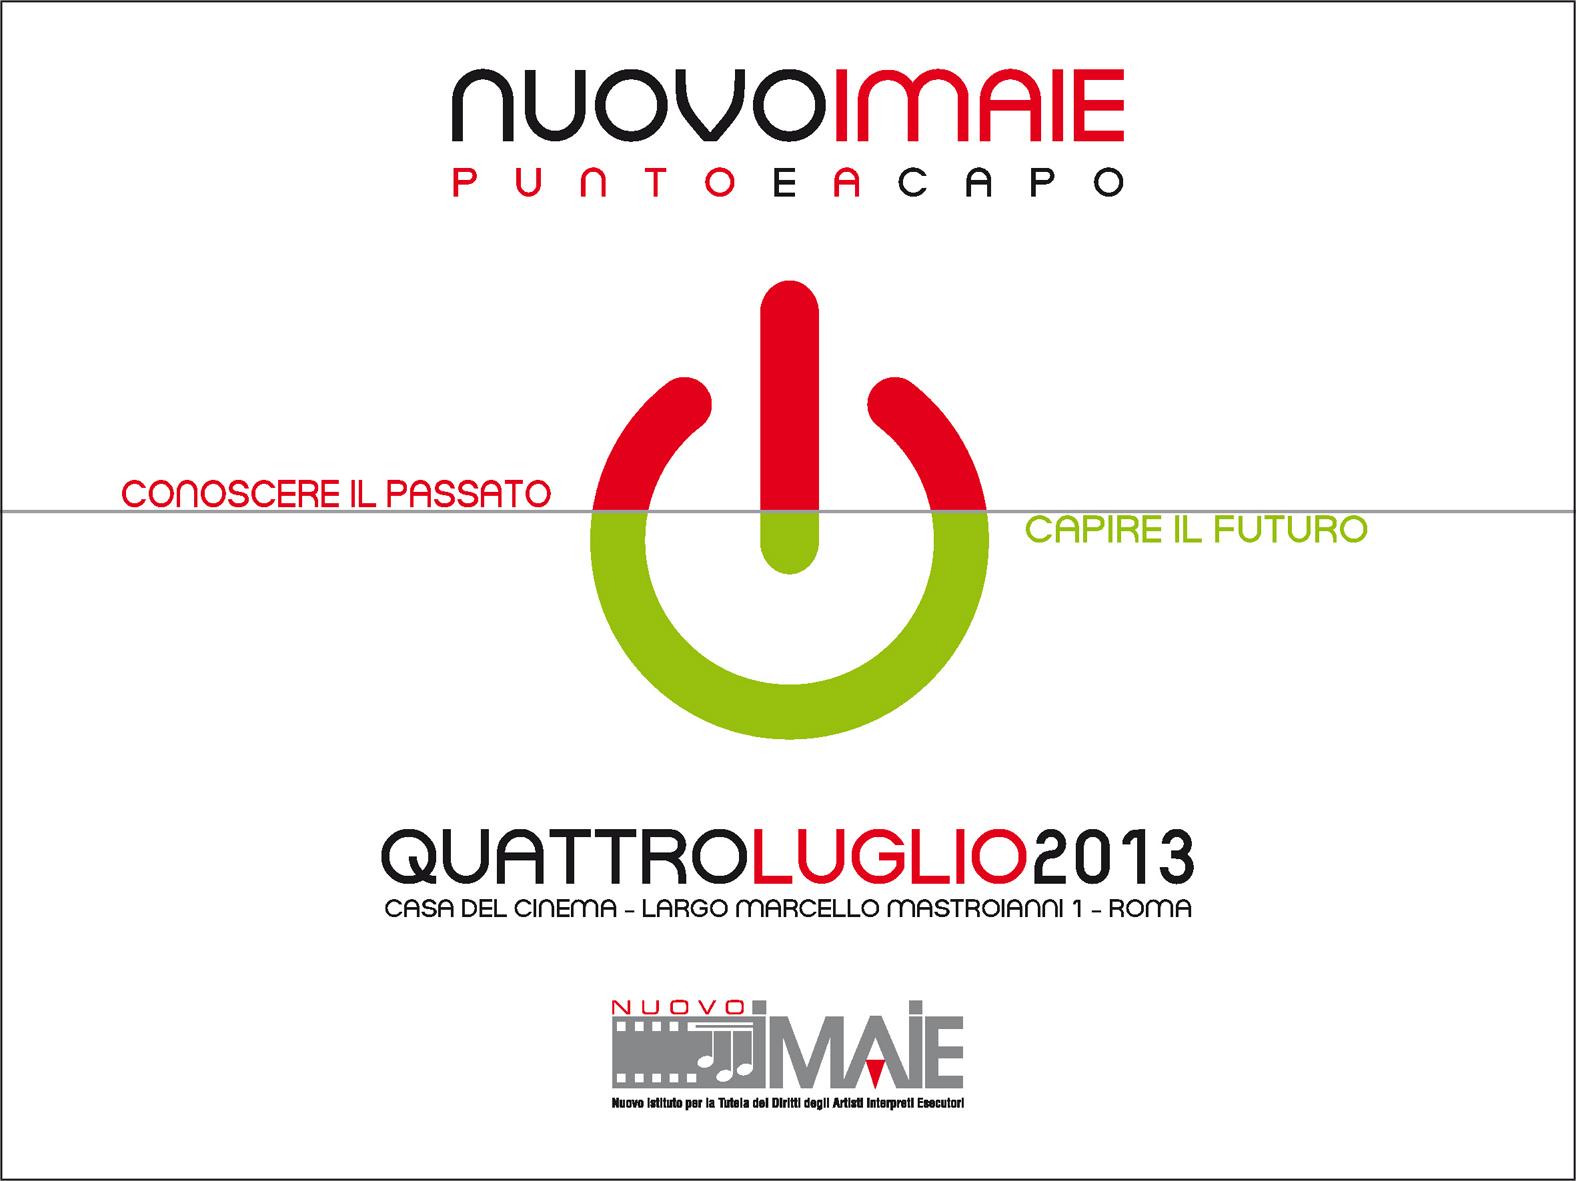 Nuovo Imaie - 4 luglio 2013